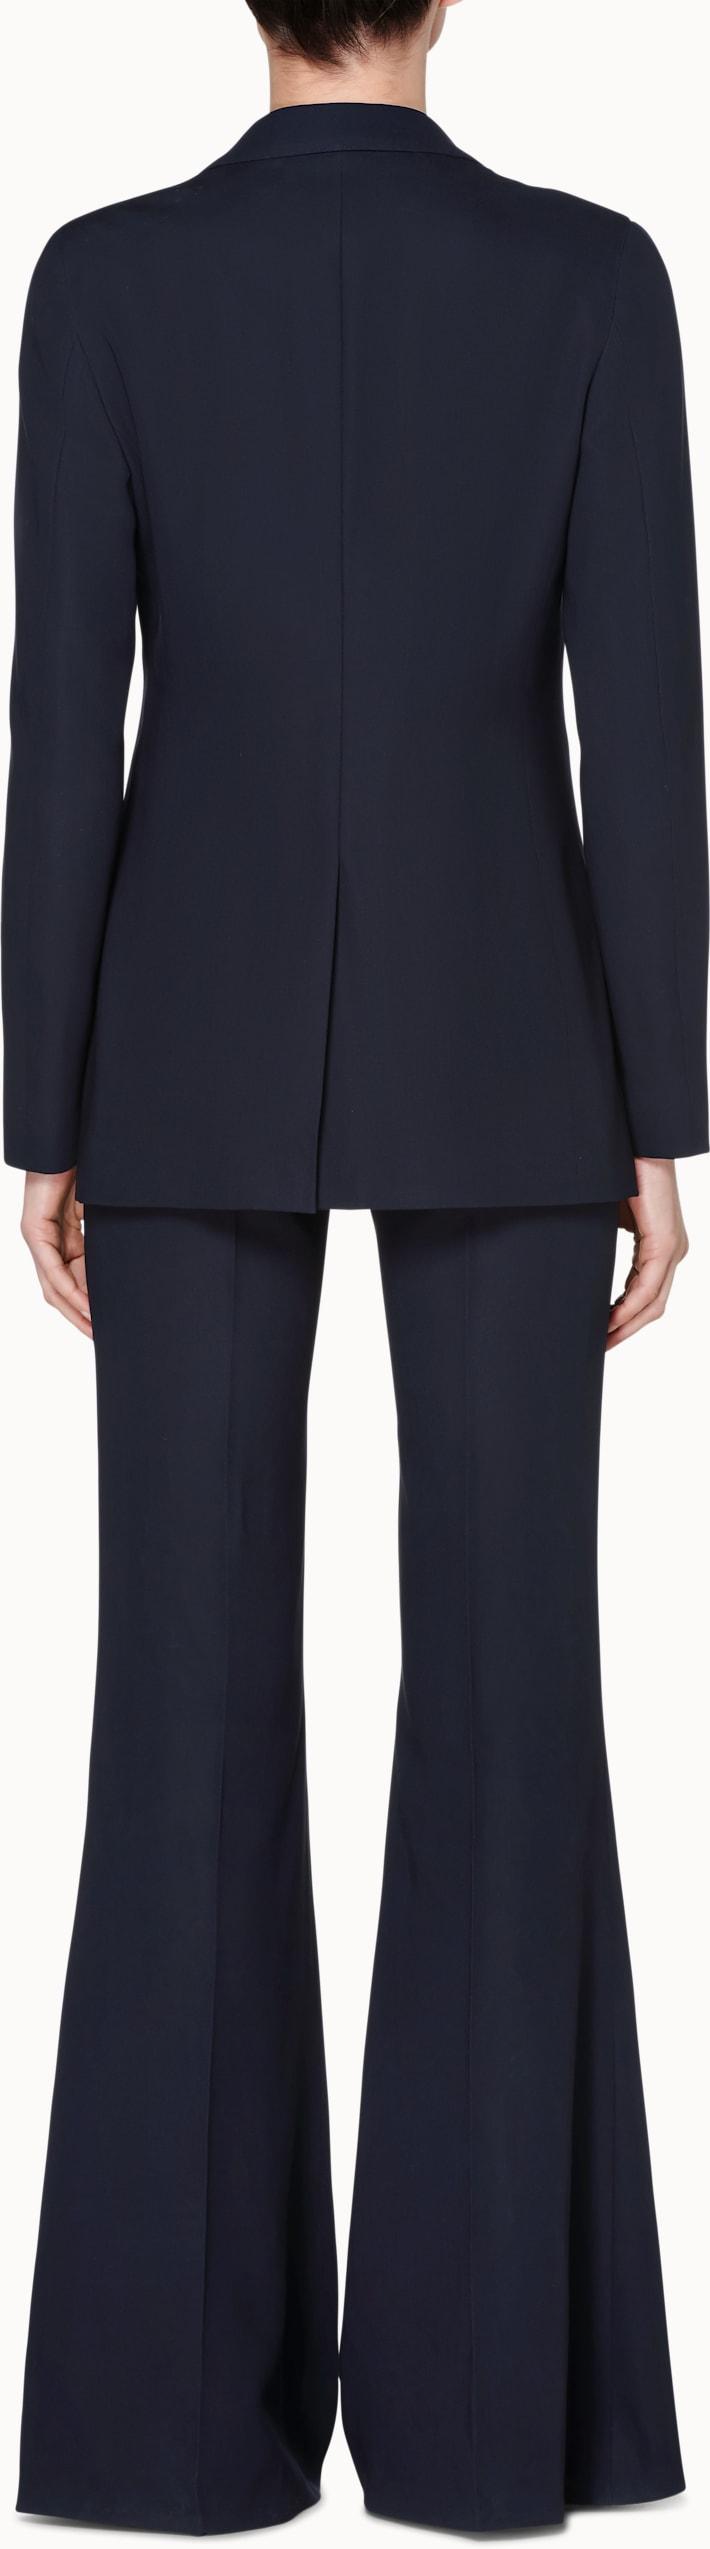 Joss Navy  Jacket